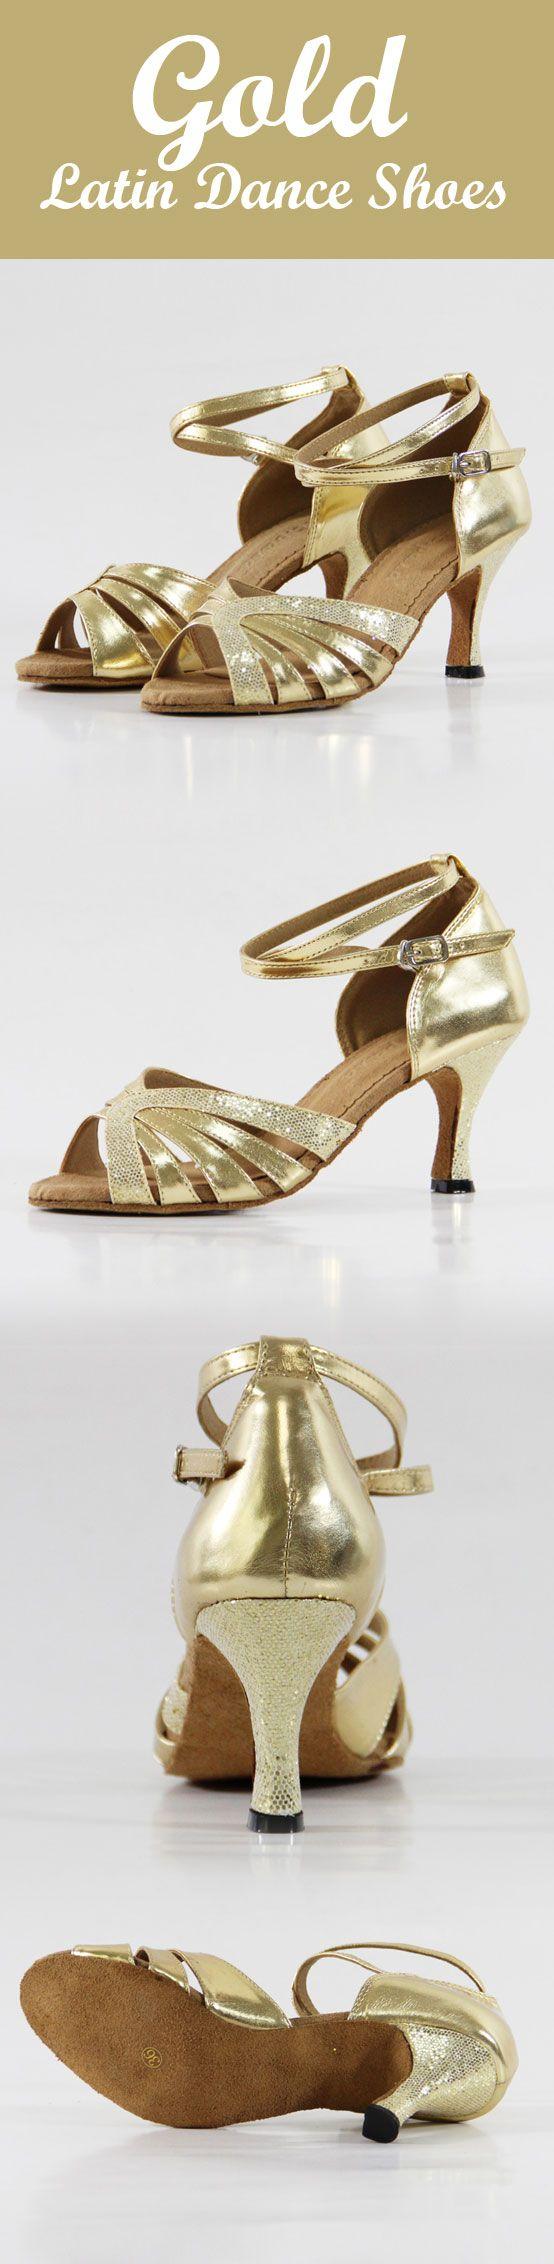 9amlatin.com: Latin Dance Shoes for Women. Color: Gold. Shoe size: US4